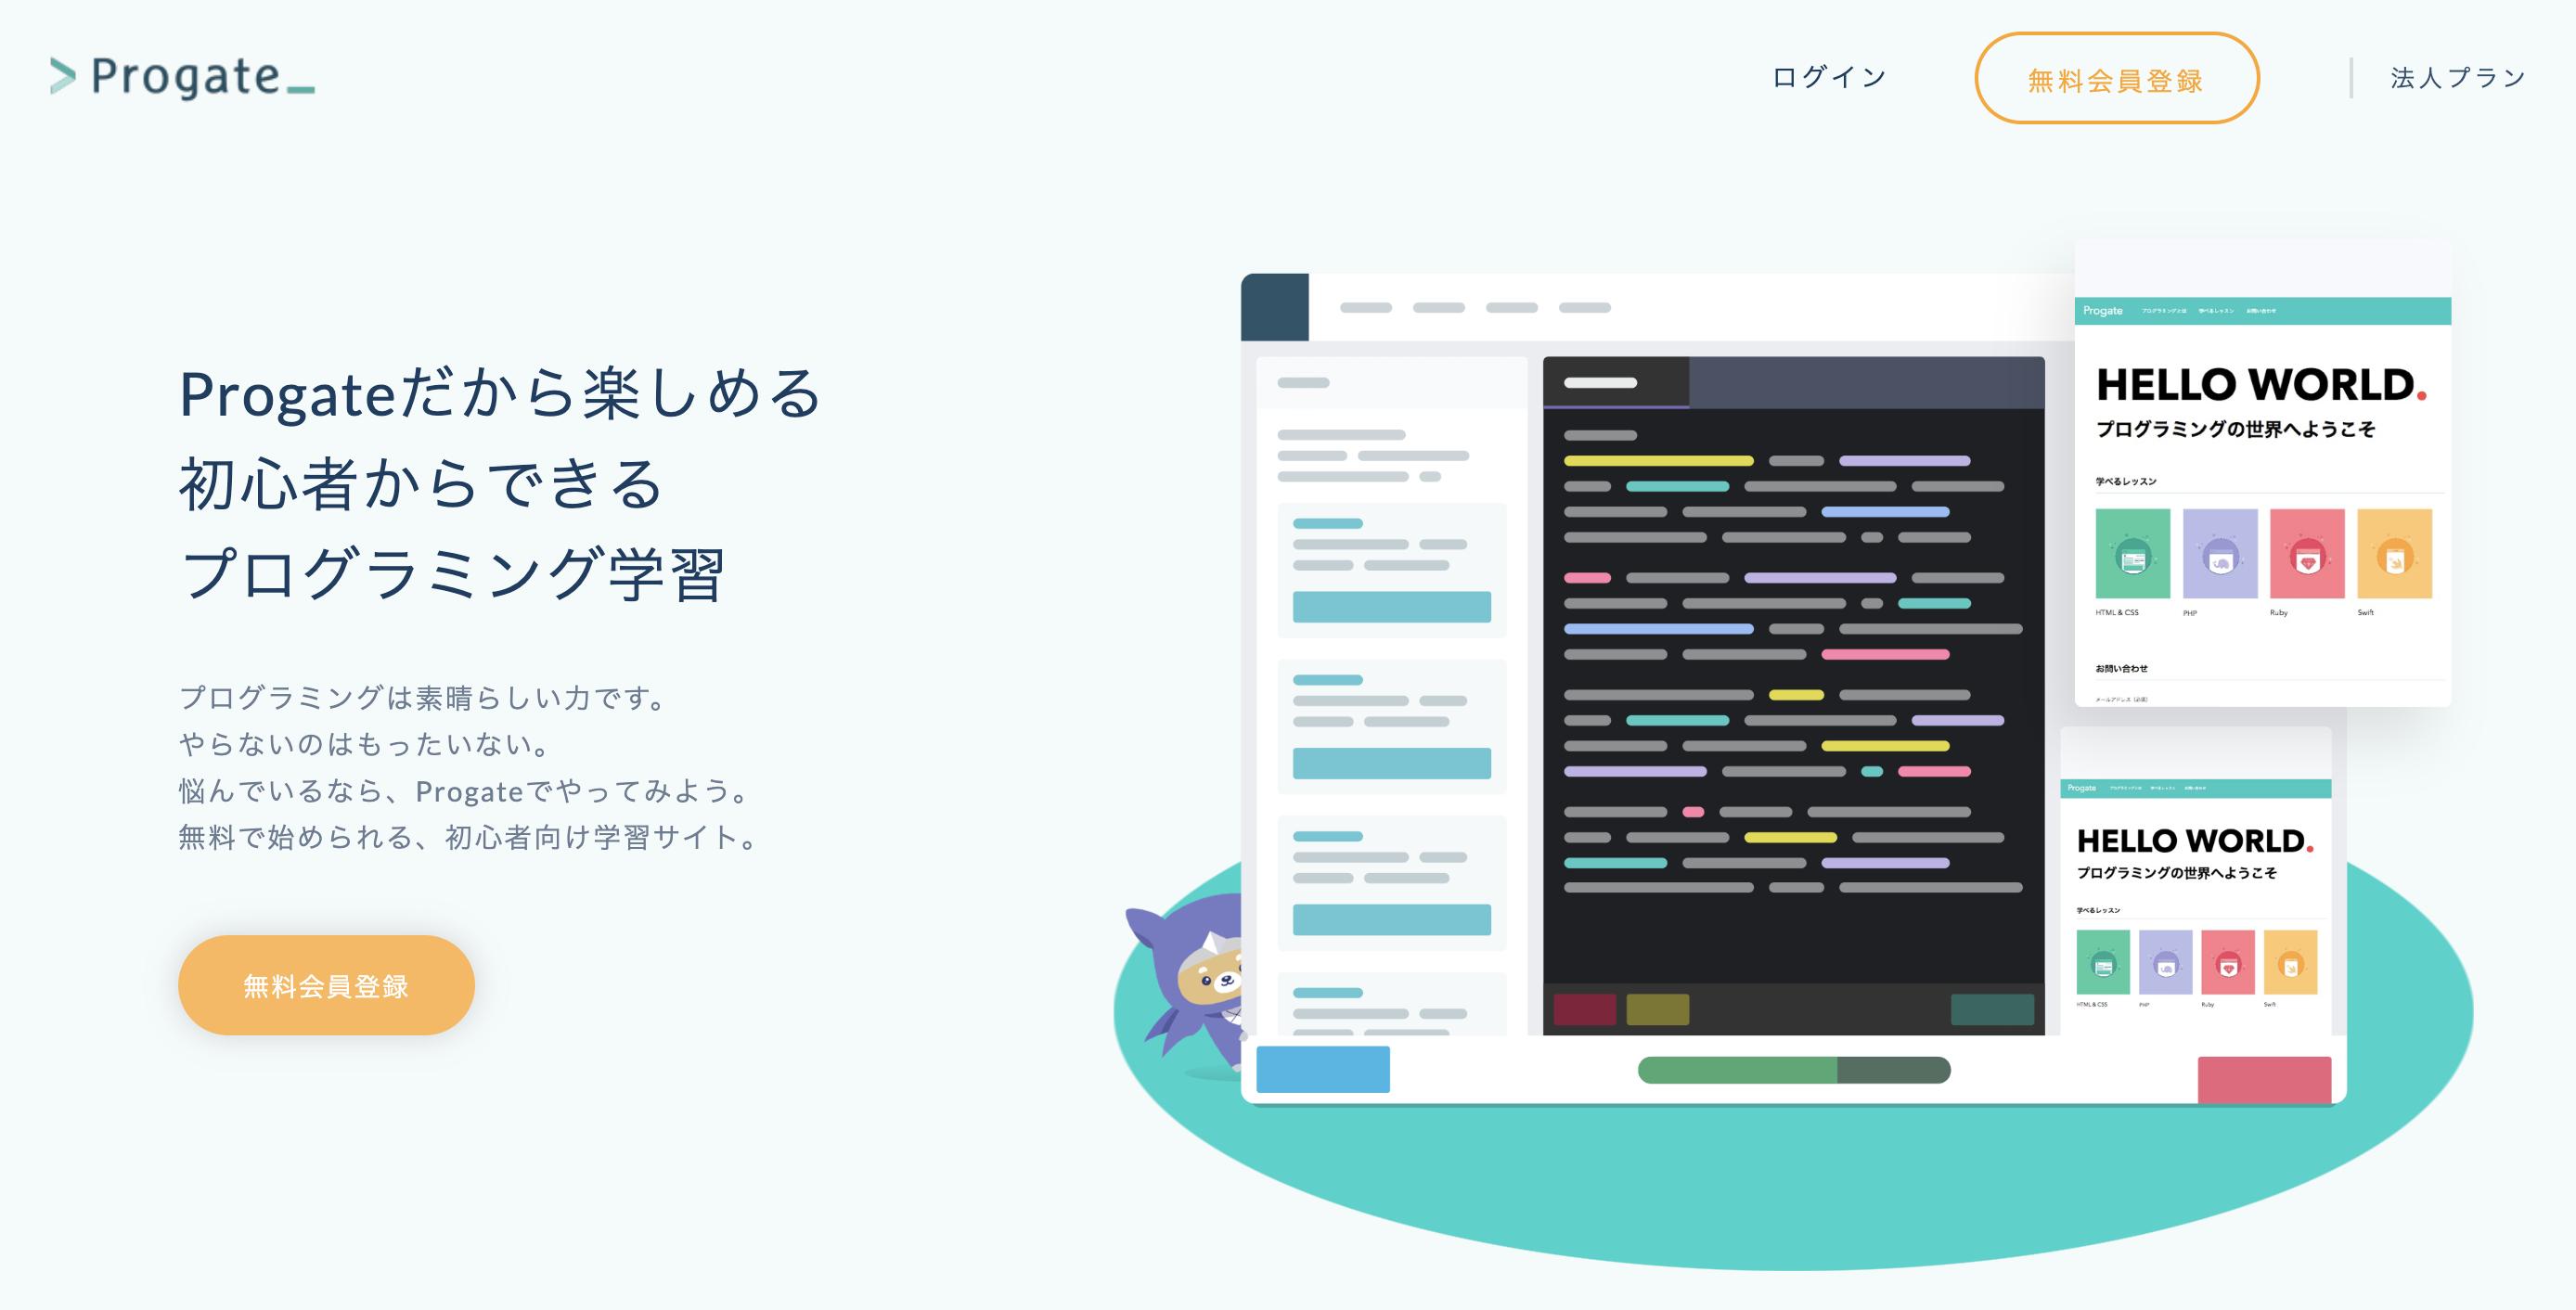 Ruby on Railsを学べるProgate